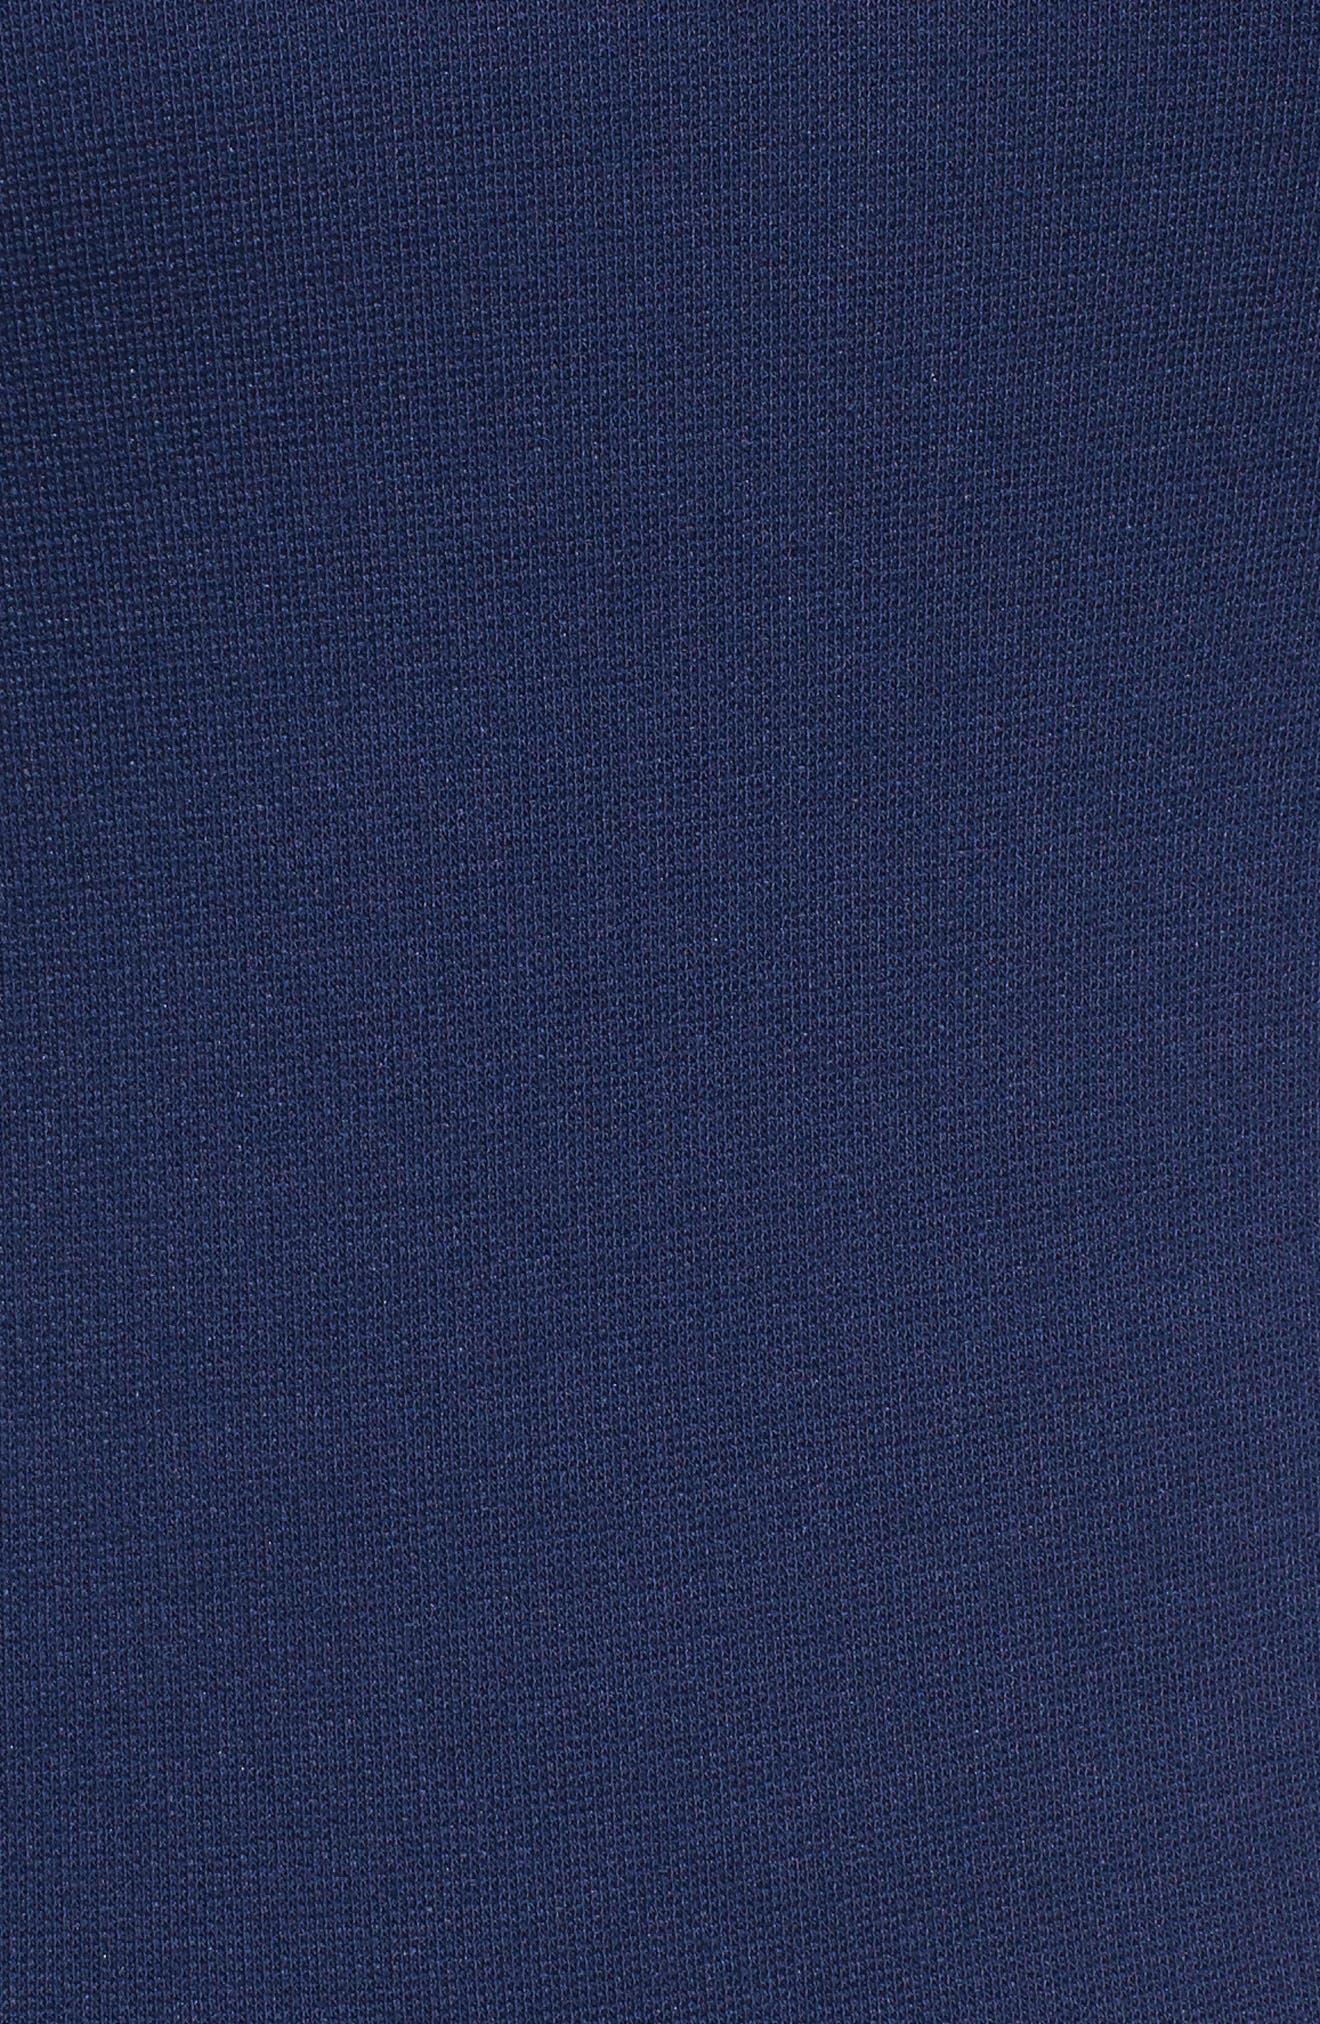 Long Sleeve Midi Dress,                             Alternate thumbnail 10, color,